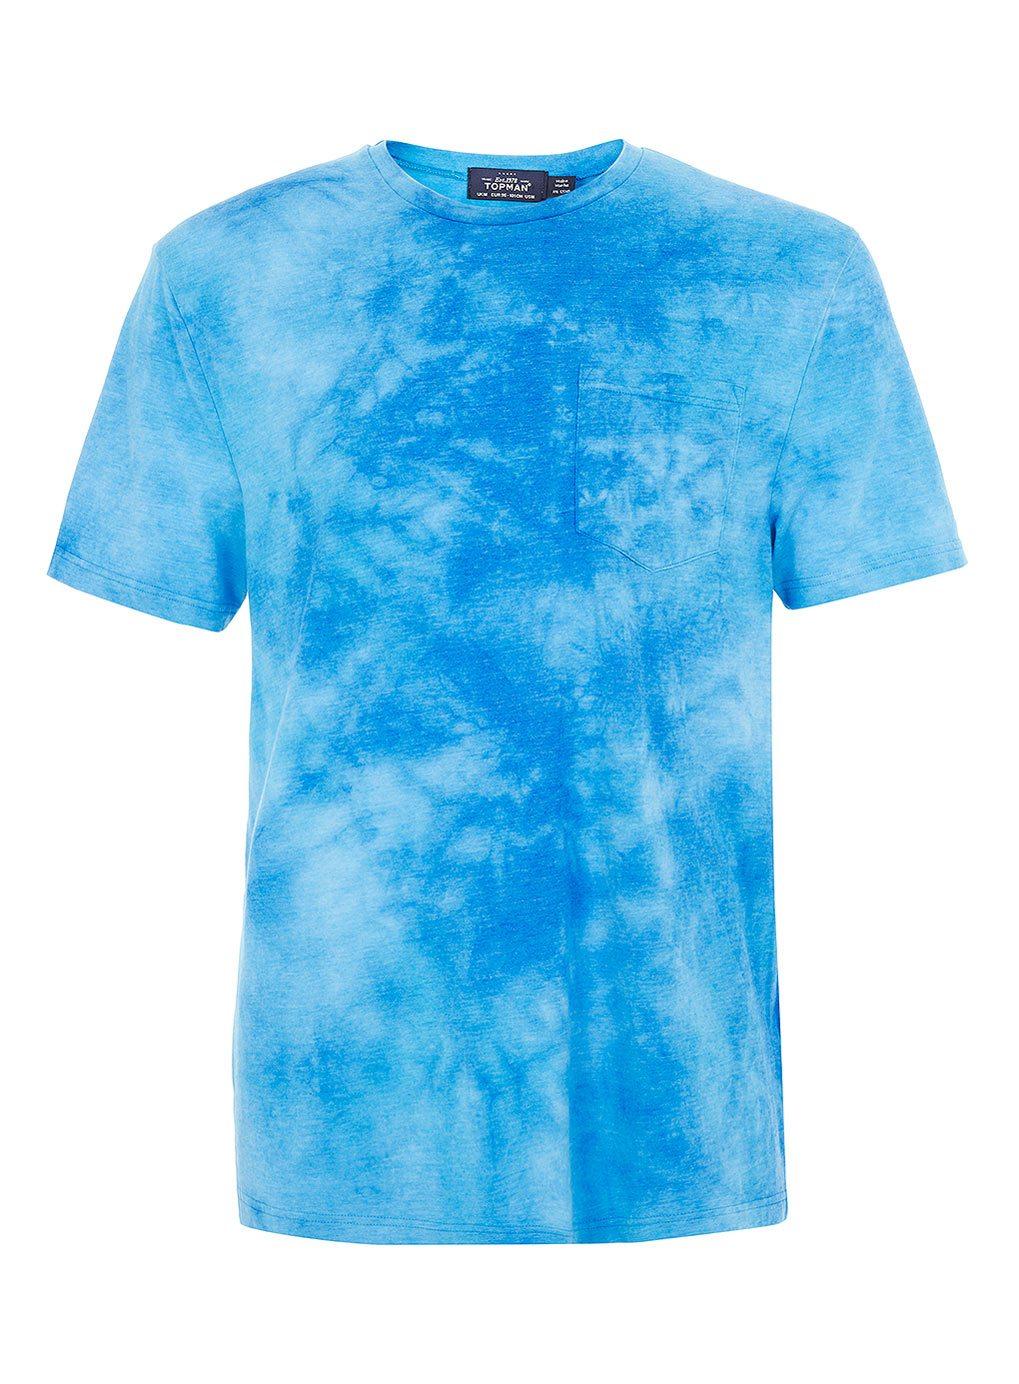 Topman-Tie-Dye-T-shirt-Blue